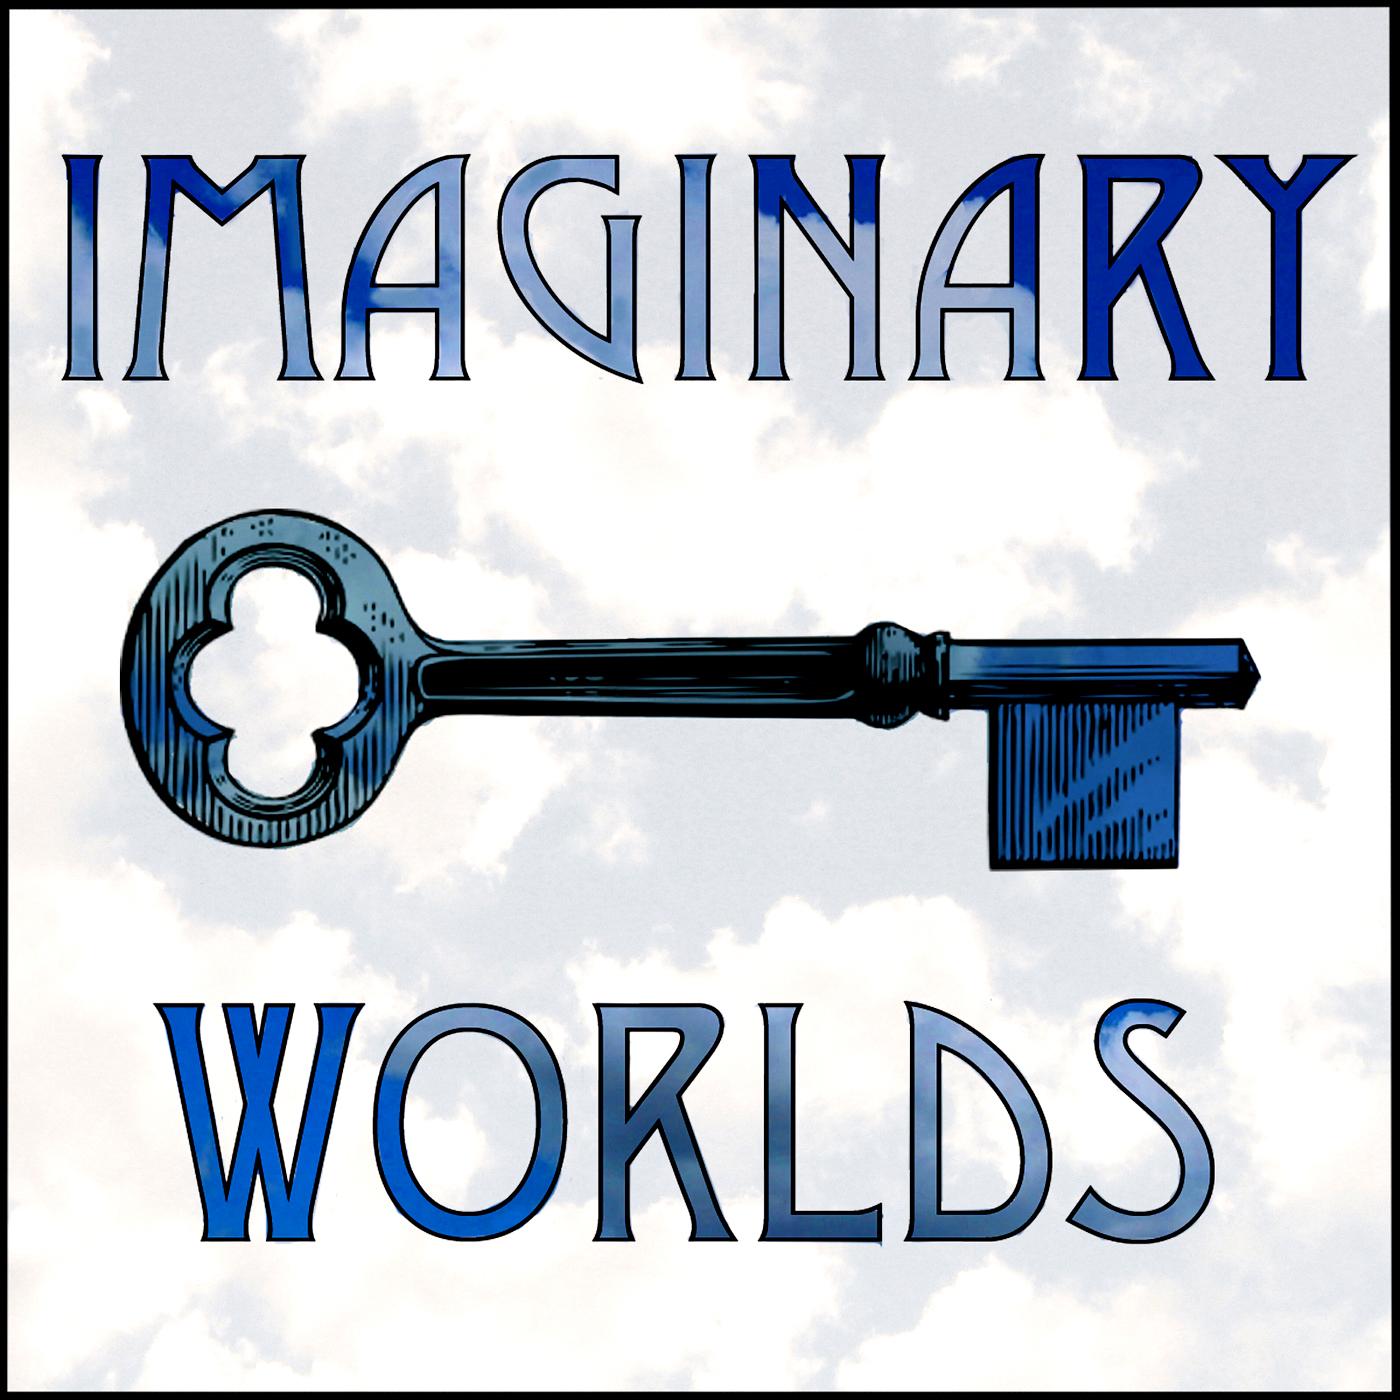 b52f077d-63e8-49df-8269-305f1062cebc-imaginaryworlds